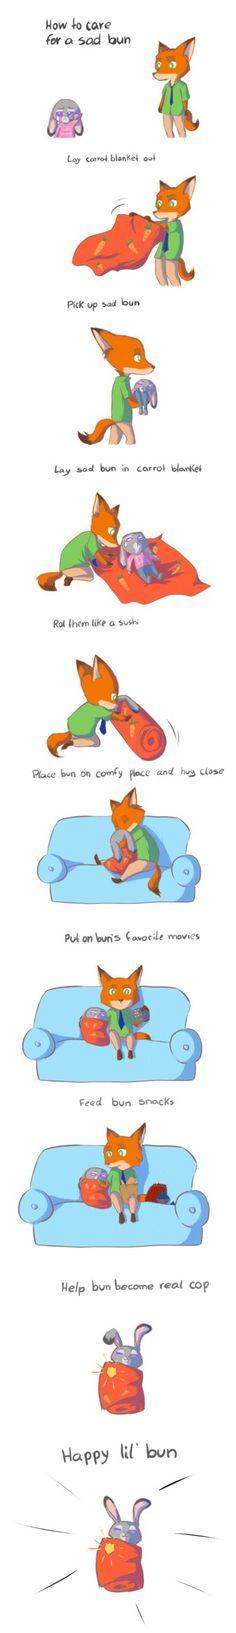 How to take care of bun by DaniiScream.deviantart.com on @DeviantArt